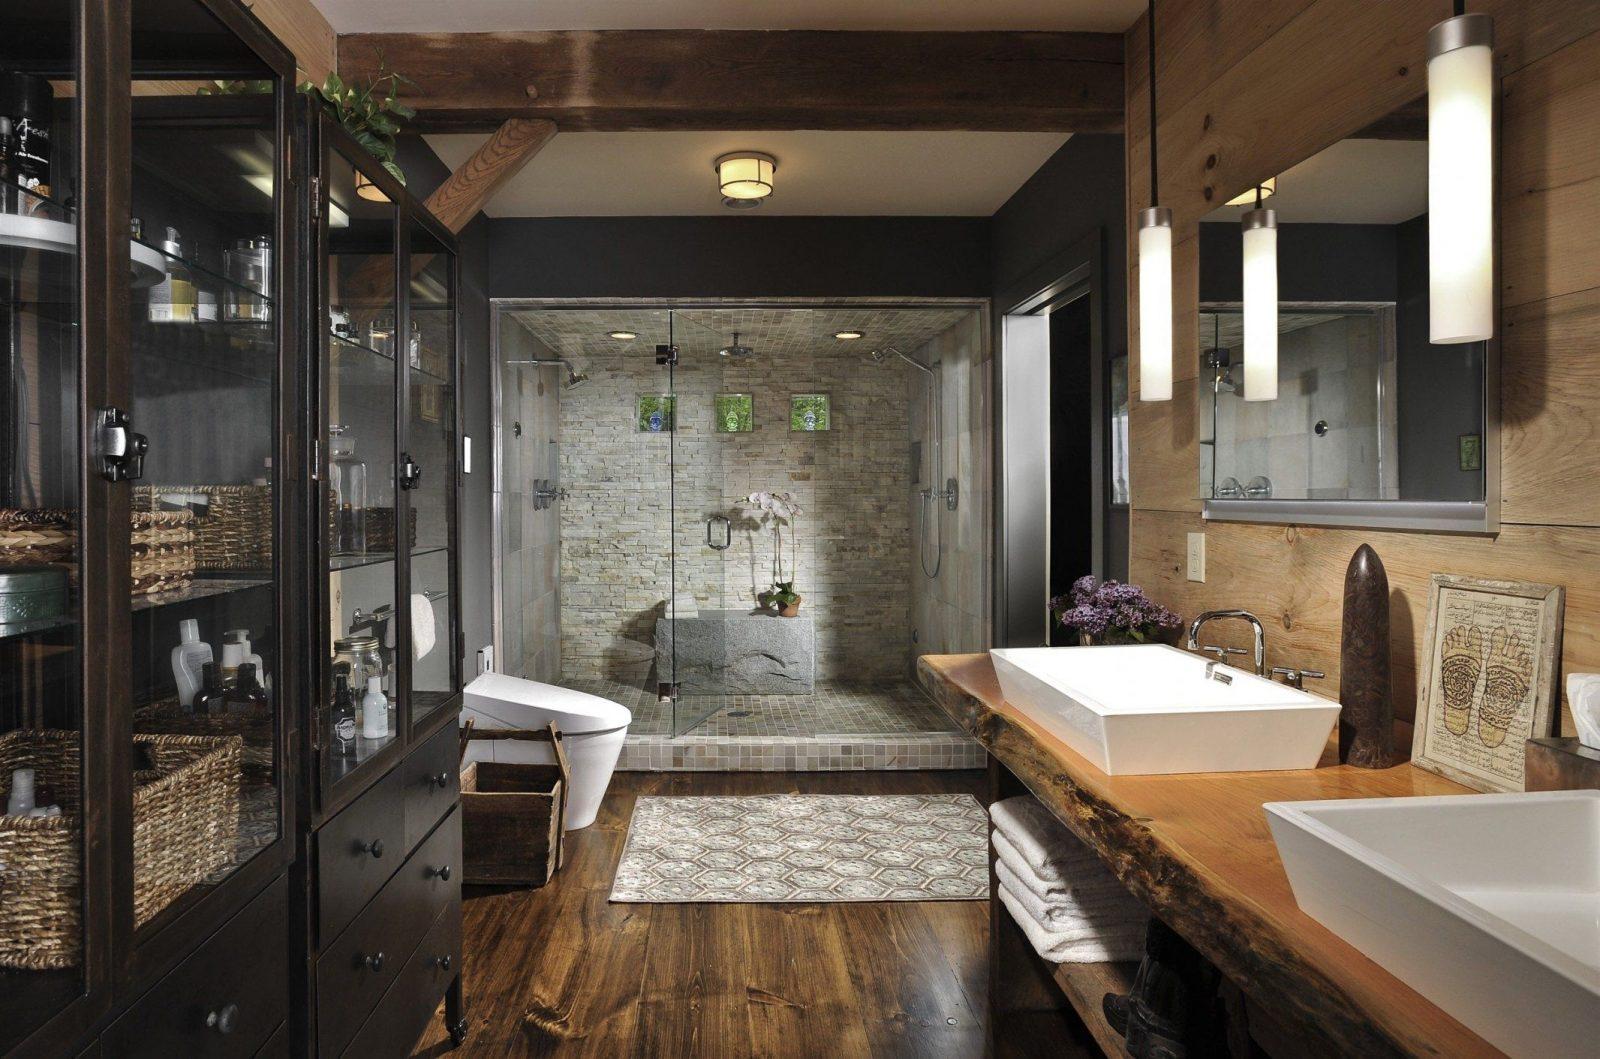 Badezimmer Rustikal Und Trotzdem Cool 23 Bescheiden Bad Rustikal von Badezimmer Rustikal Und Trotzdem Cool Bild